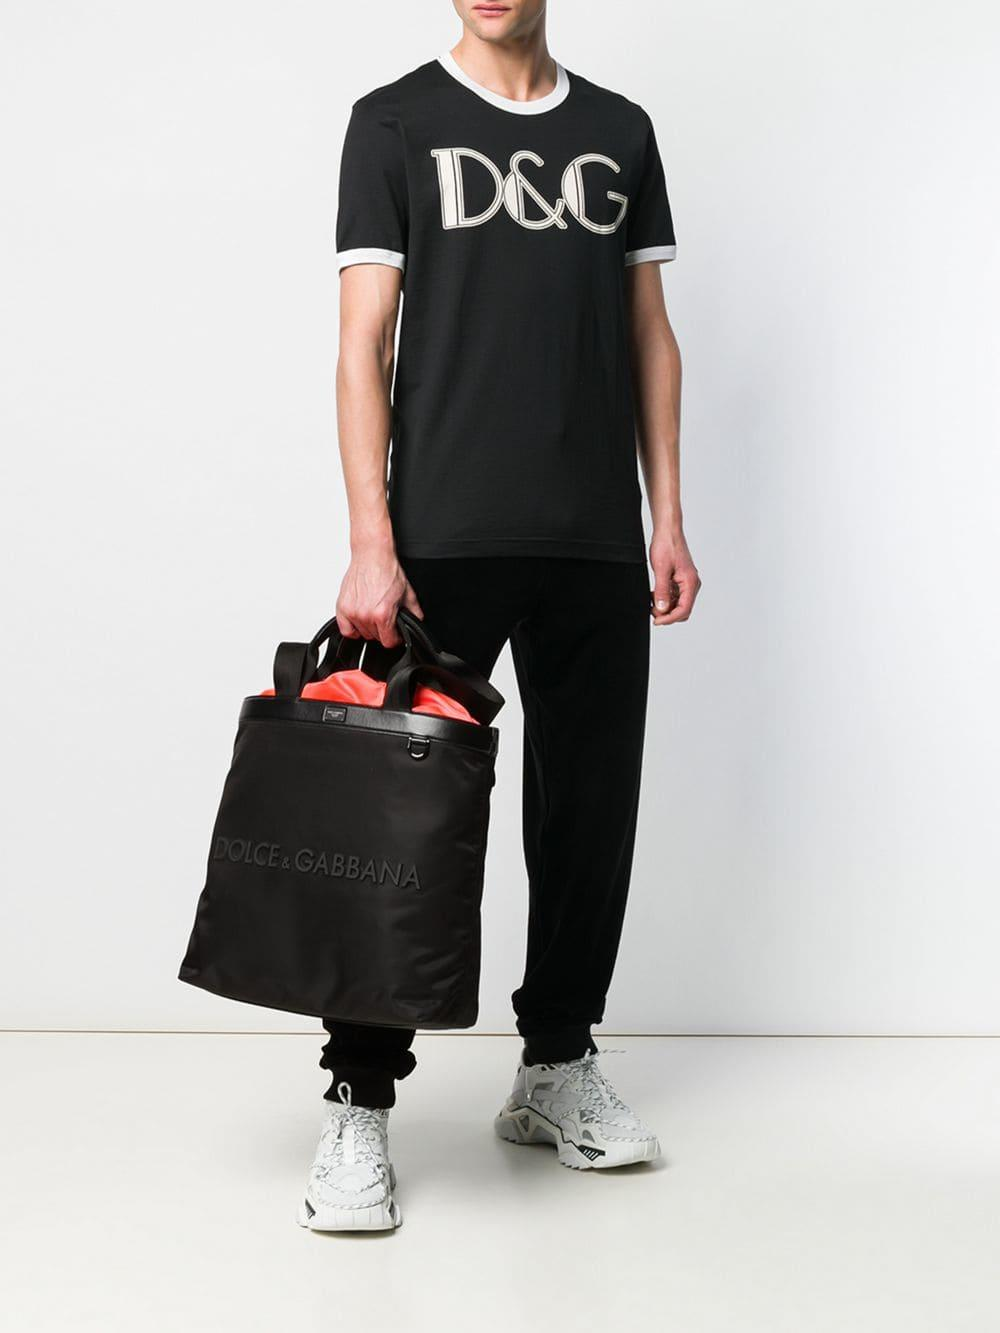 Dolce   Gabbana - Black Rubberised Logo Shopping Bag for Men - Lyst. View  fullscreen 895e22ac5f413